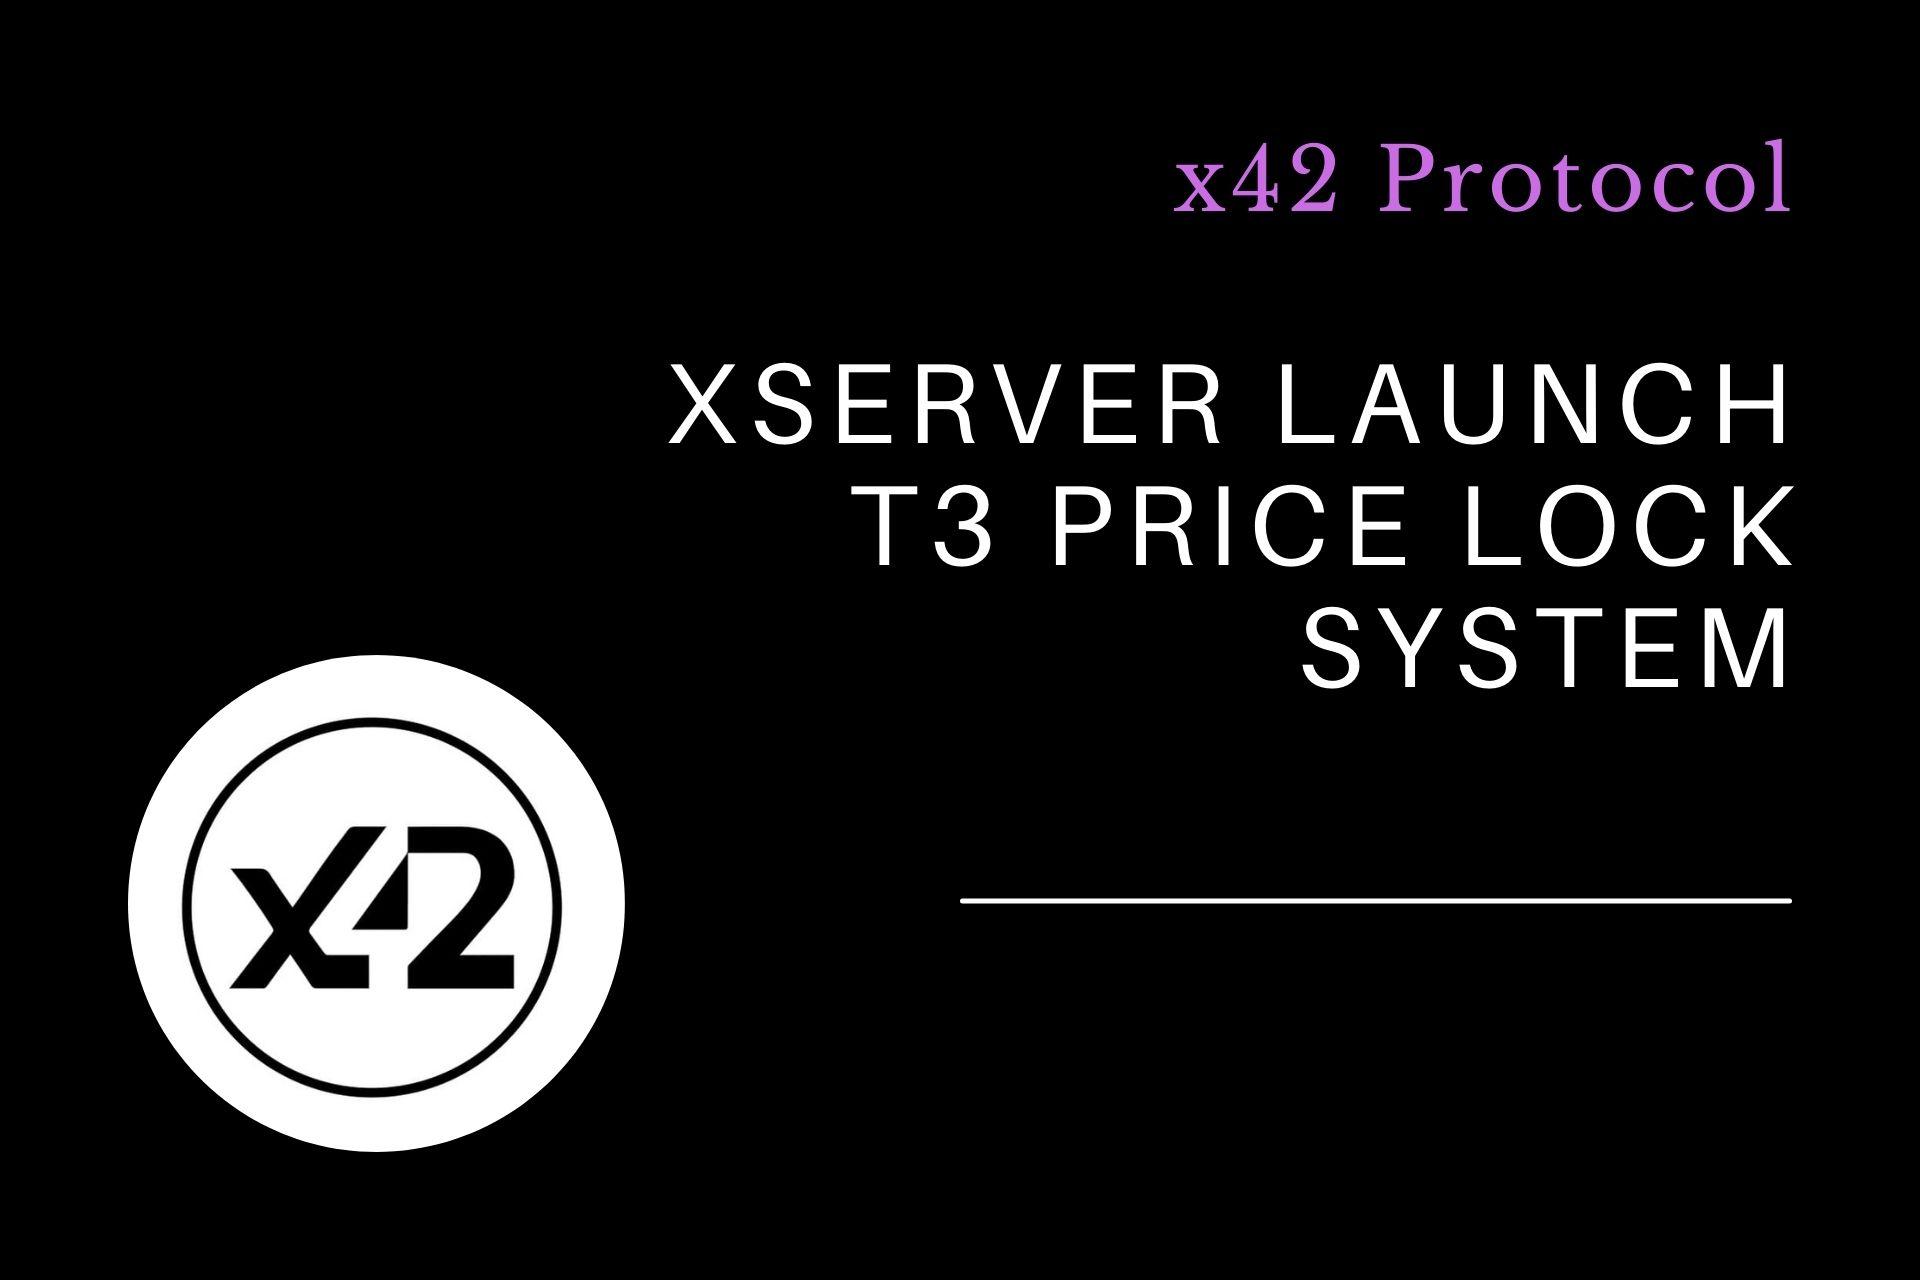 x42 Protocol | Xserver Launch T3 Price Lock System